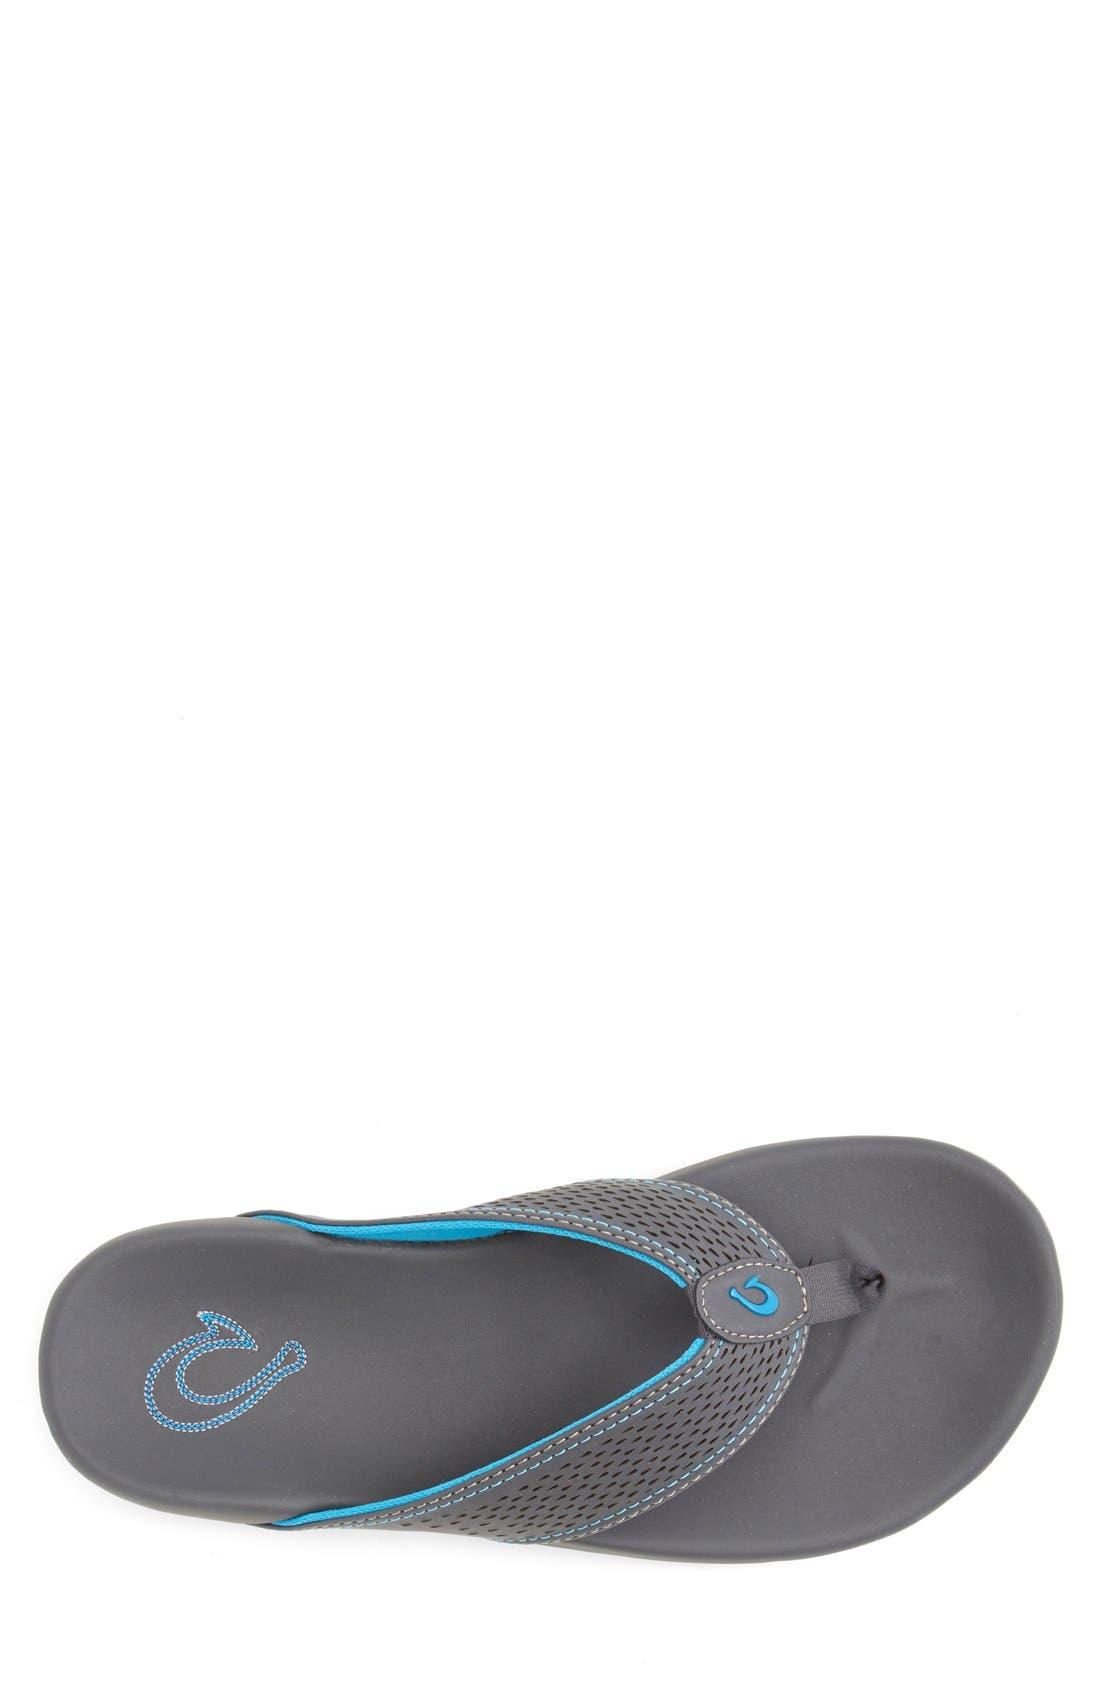 OLUKAI,                             'Kekoa' Water Resistant Perforated Flip Flop,                             Alternate thumbnail 4, color,                             029